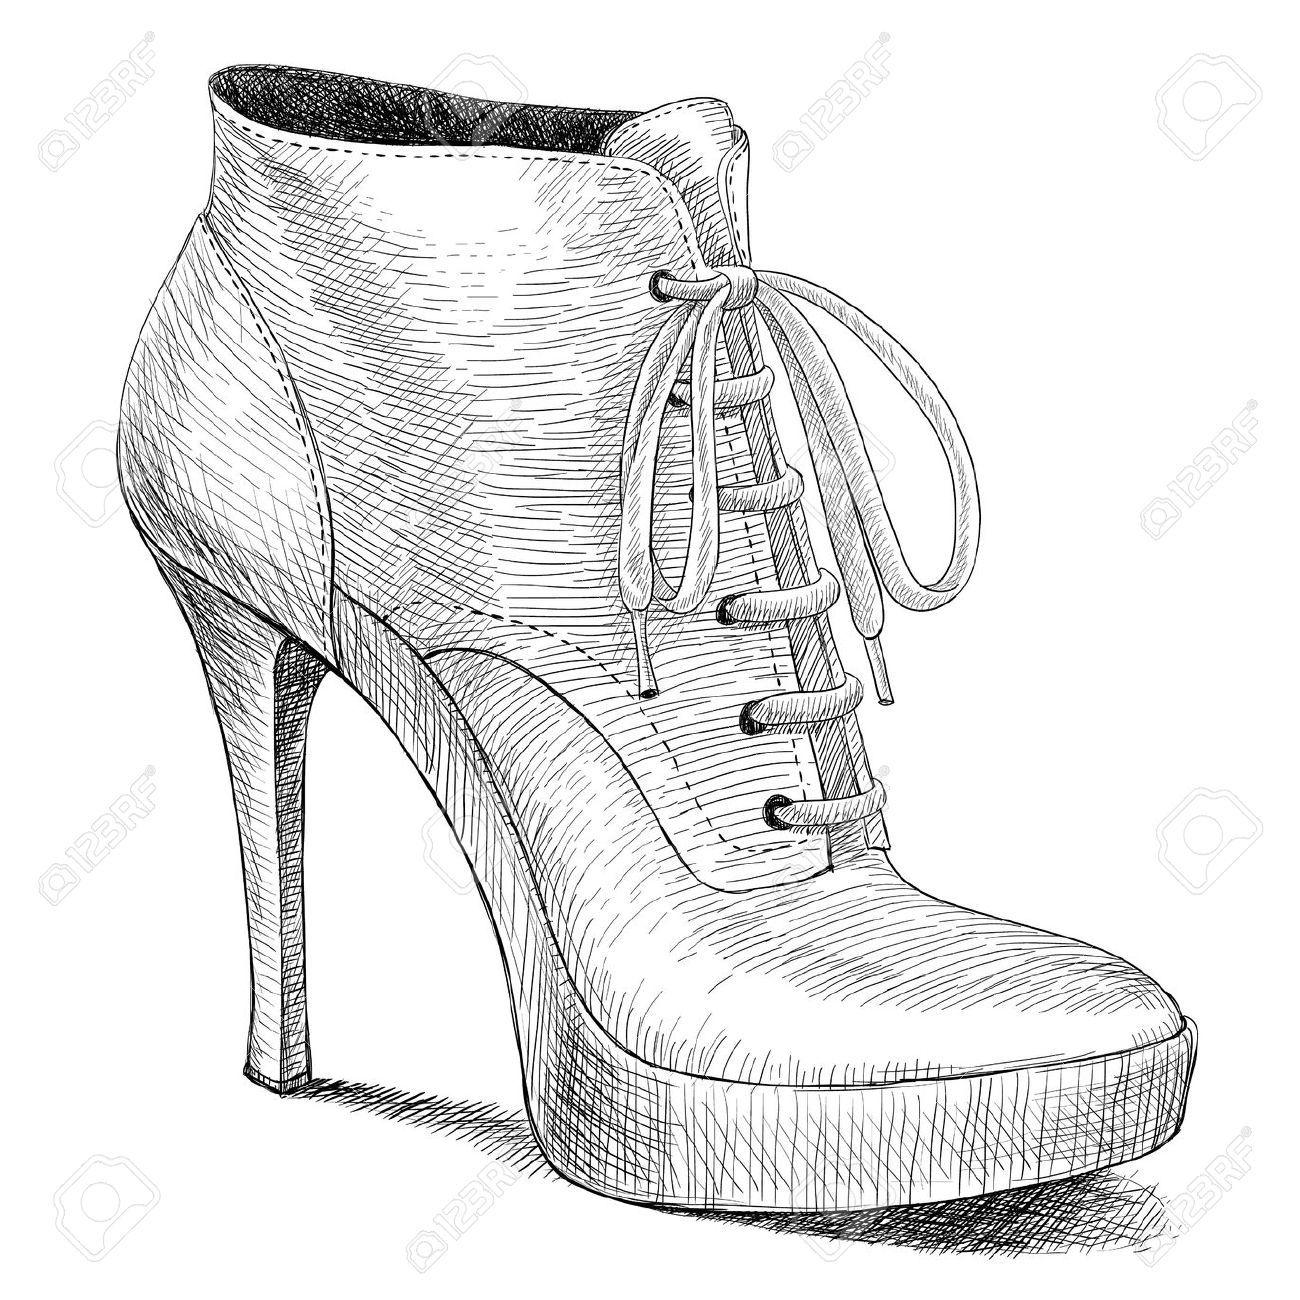 Shoe Flower Line Drawing : Afficher l image d origine rf pinterest images